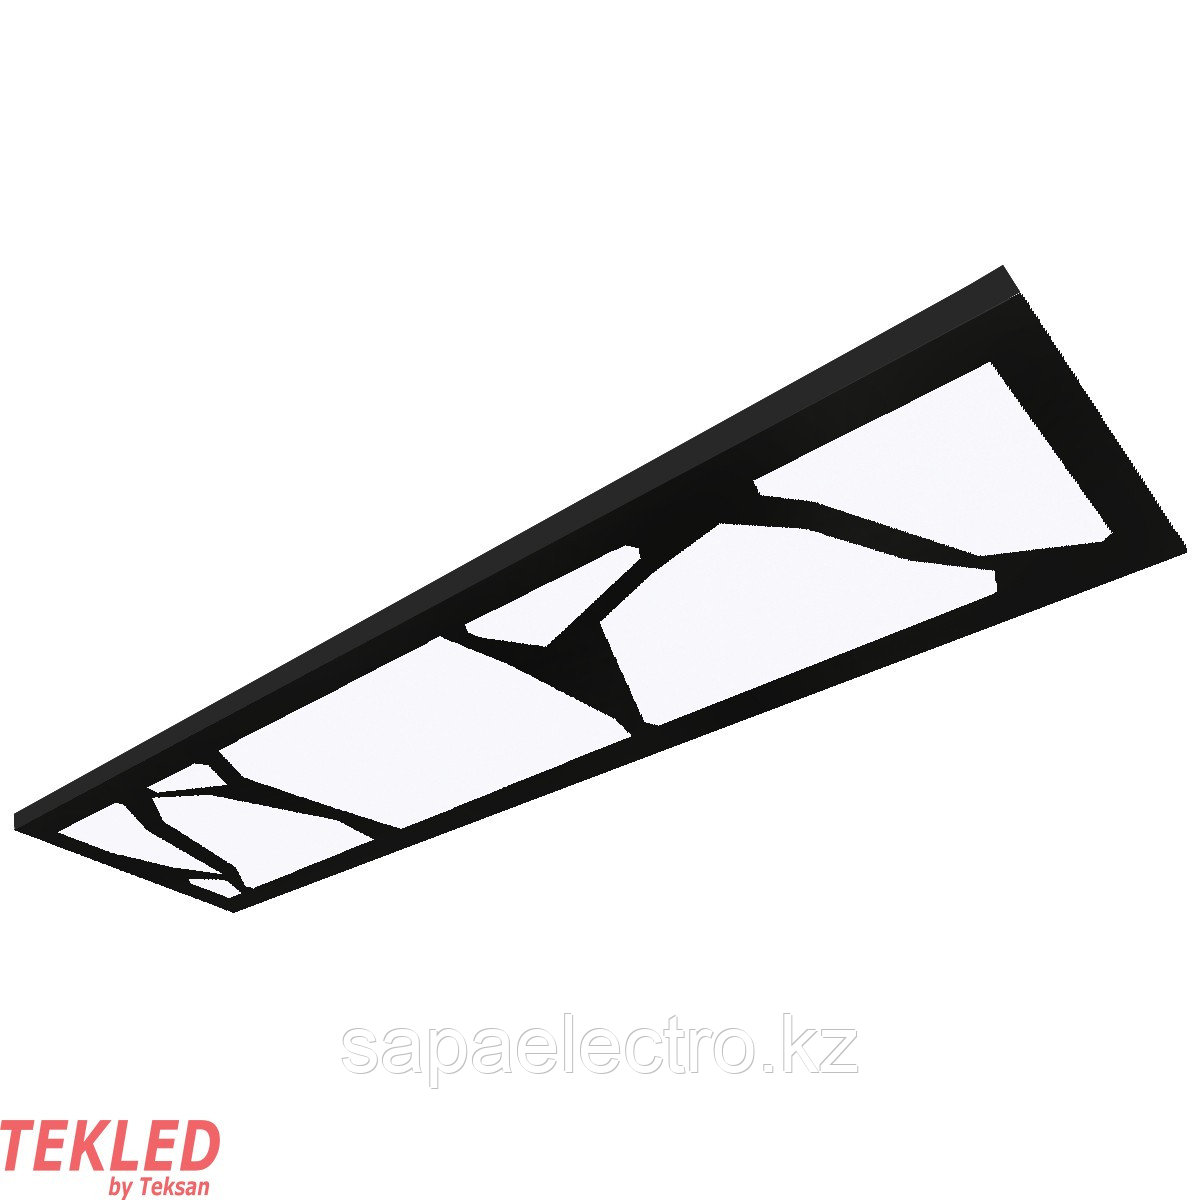 Св-к  OPALLED MARBLE 48W BLACK S/U  1200x300 5700K